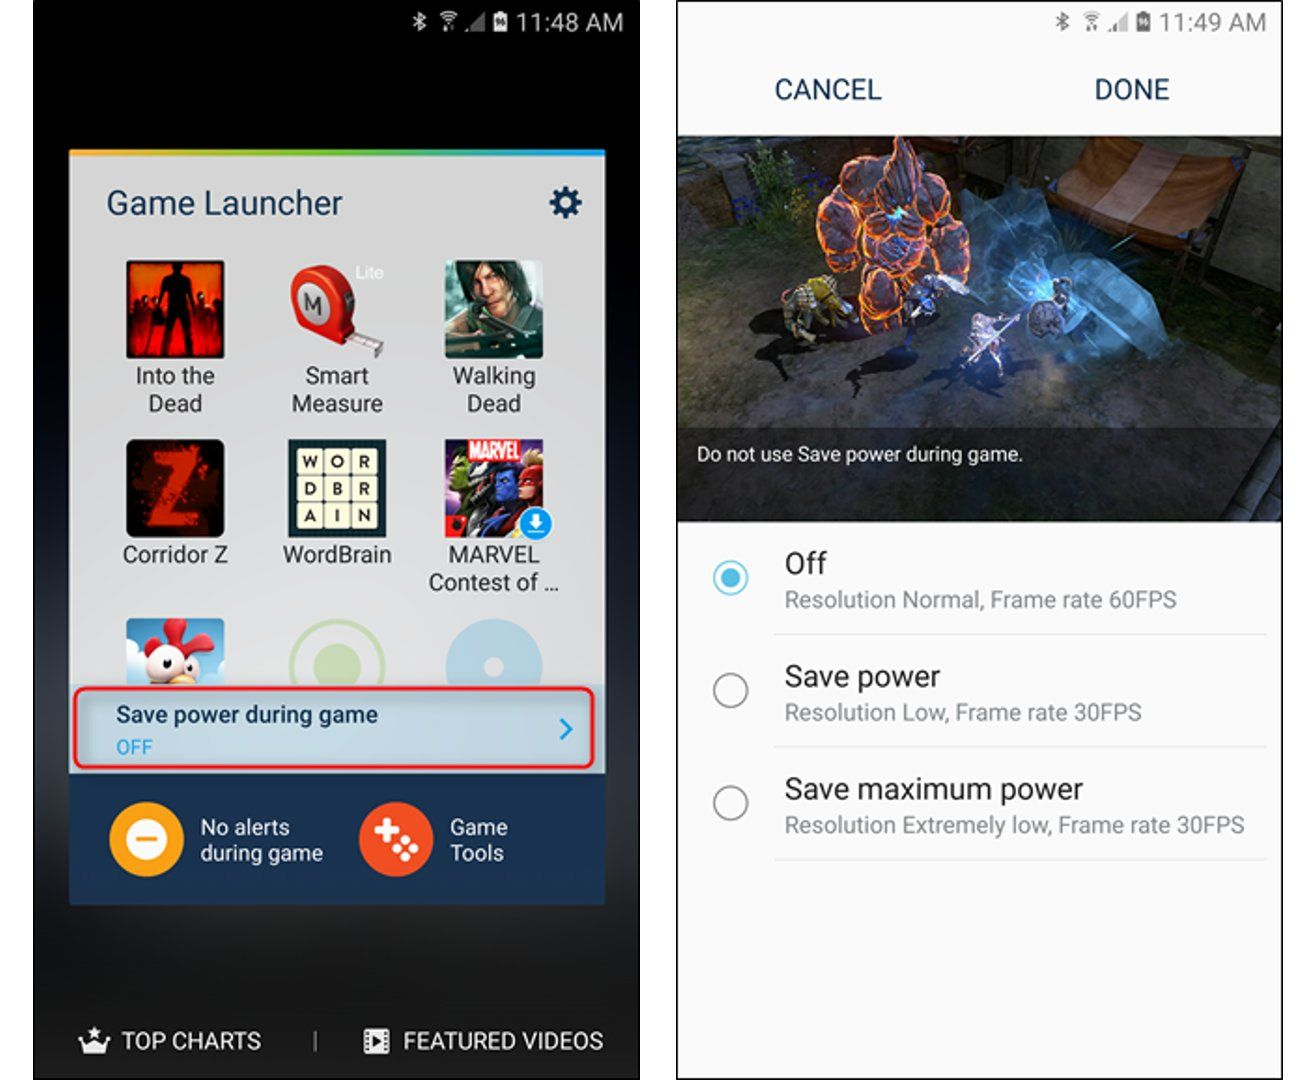 Samsung Game Launcher - Power Saving Mode